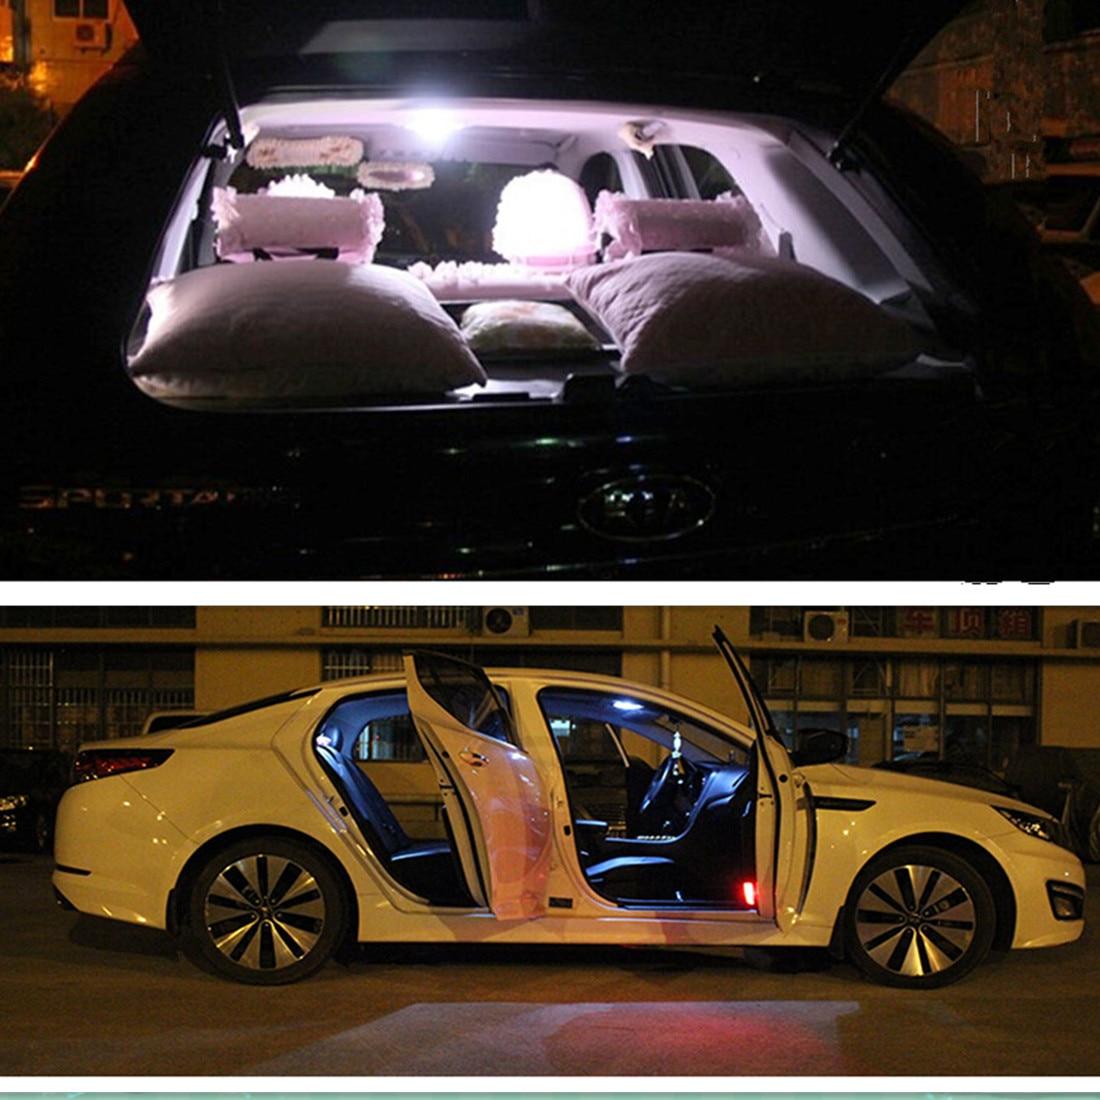 7pcs Car LED  light kit package for KIA Sorento 2002-2008 Dome Rear Trunk License plate lights shanghai chun shu chunz chun leveled kp1000a 1600v convex plate scr thyristors package mail